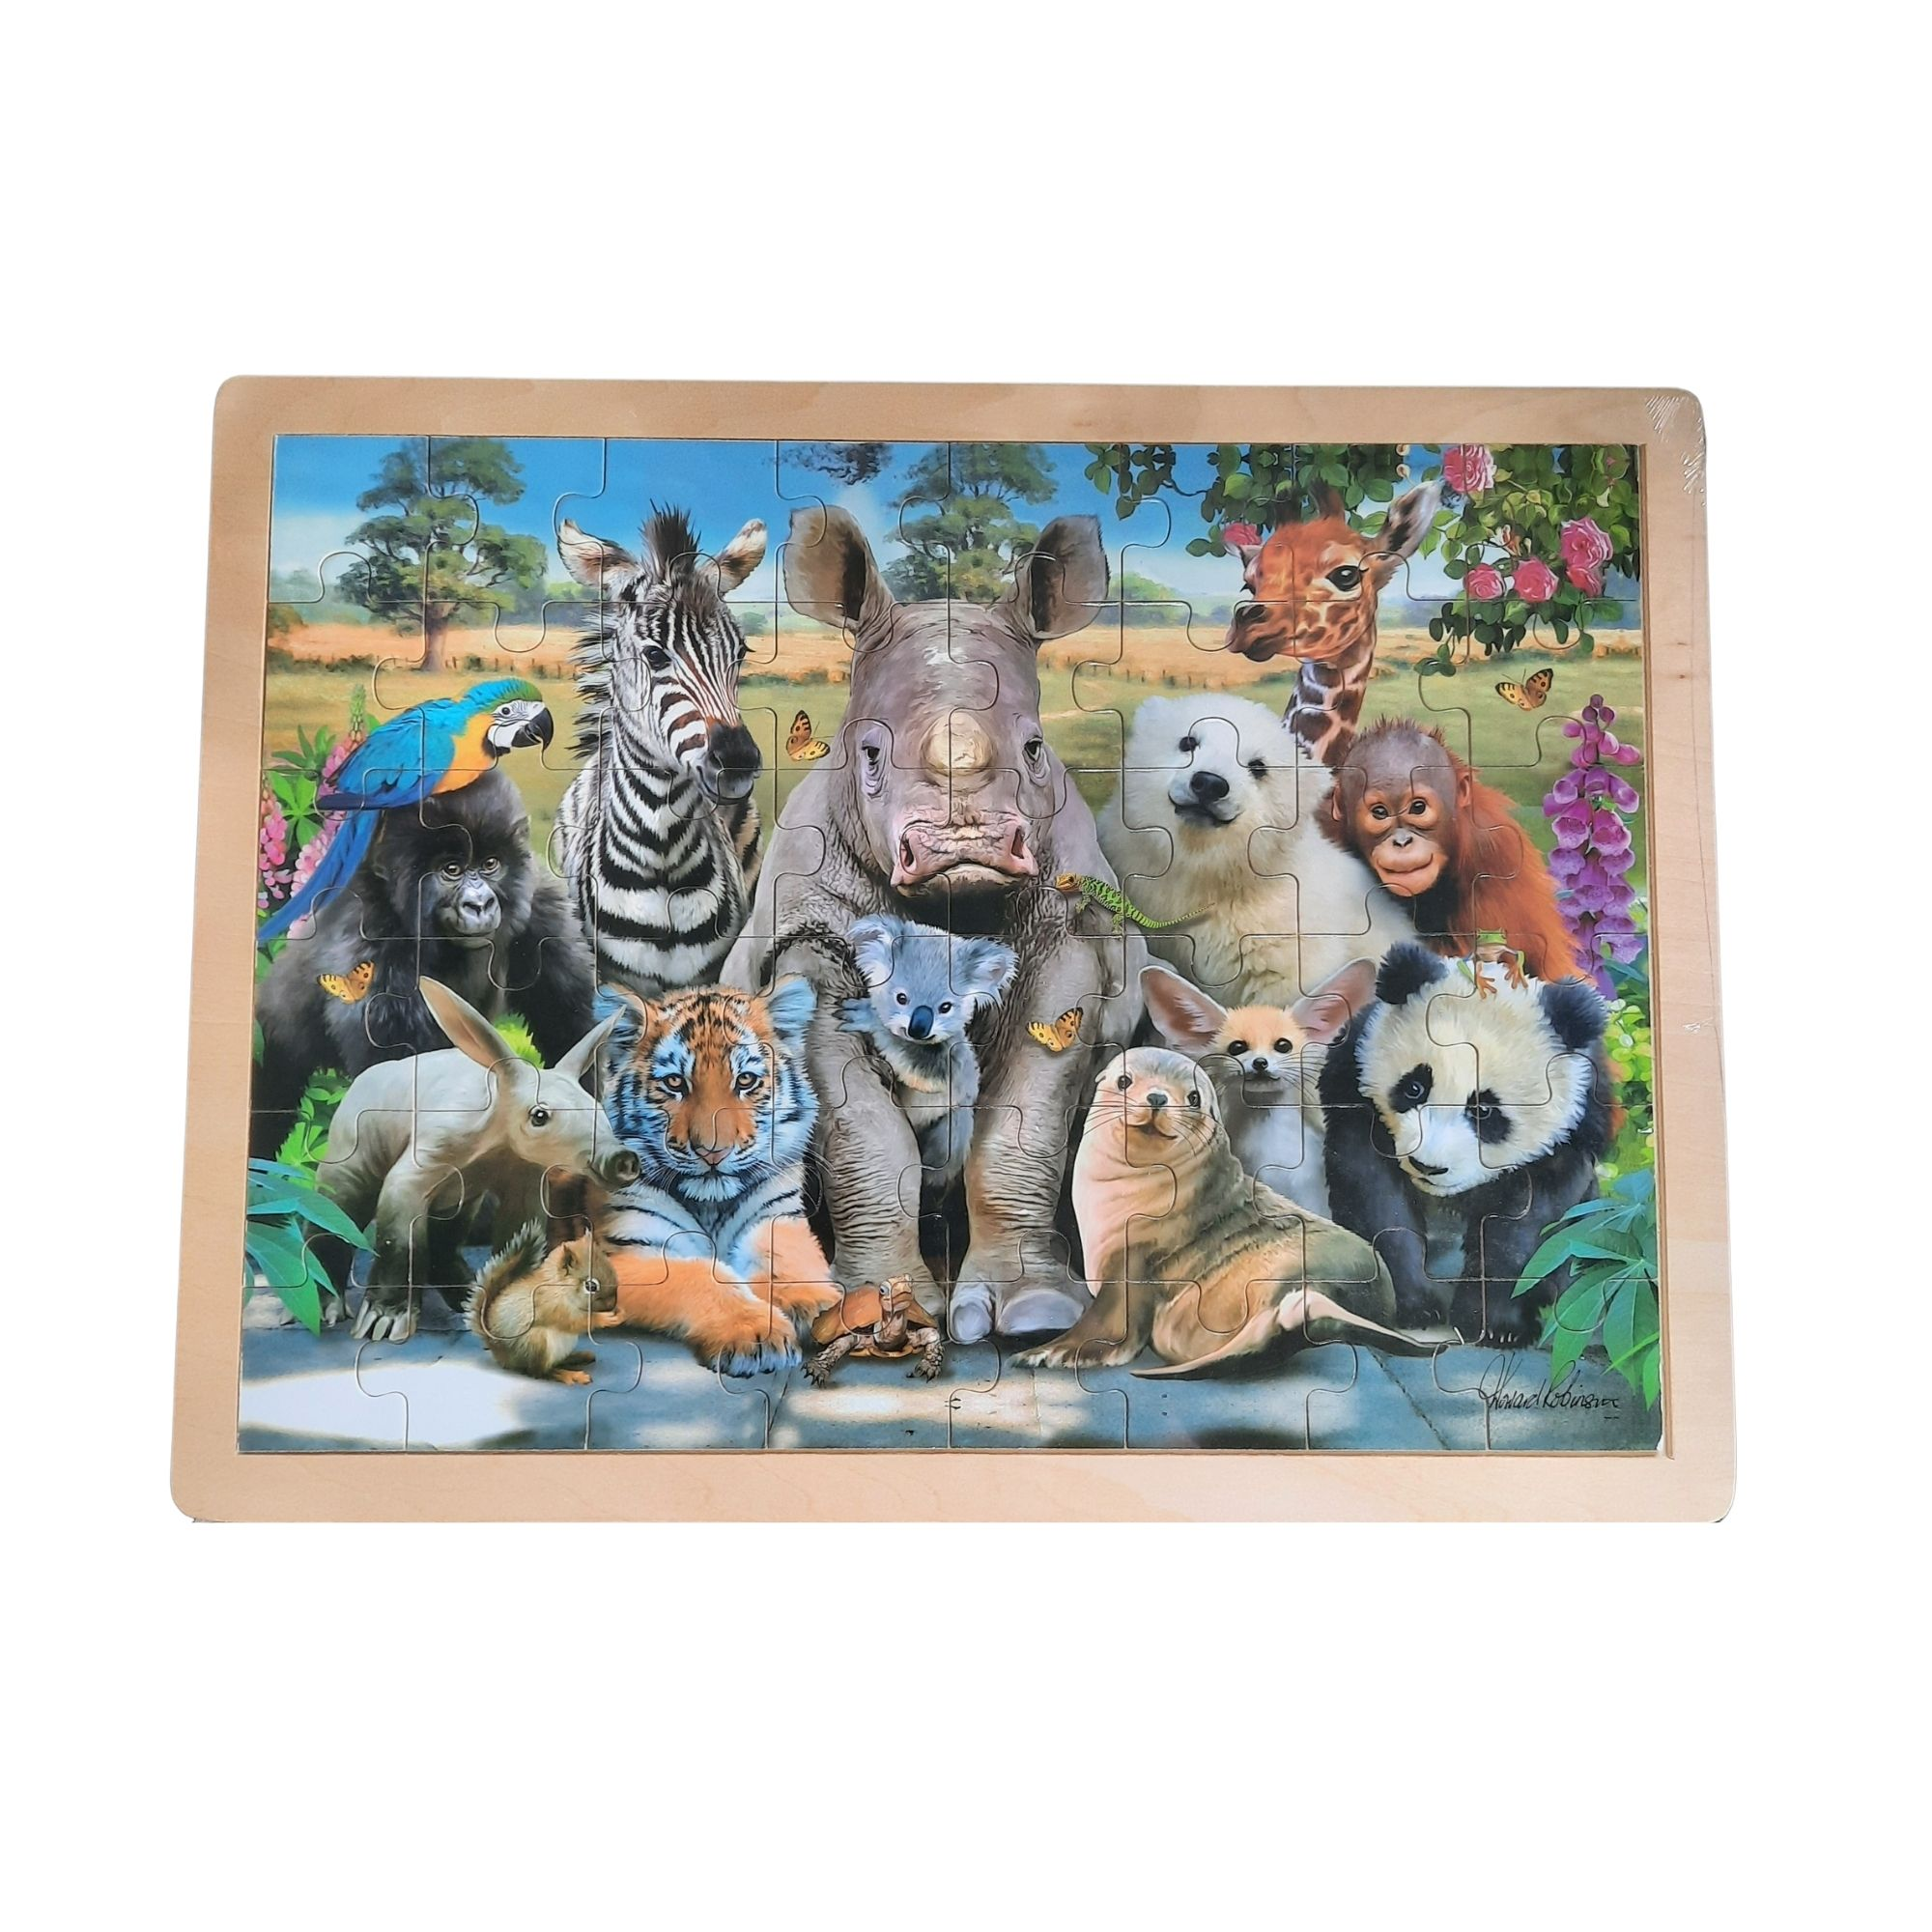 Holzpuzzle mit Tiermotiven